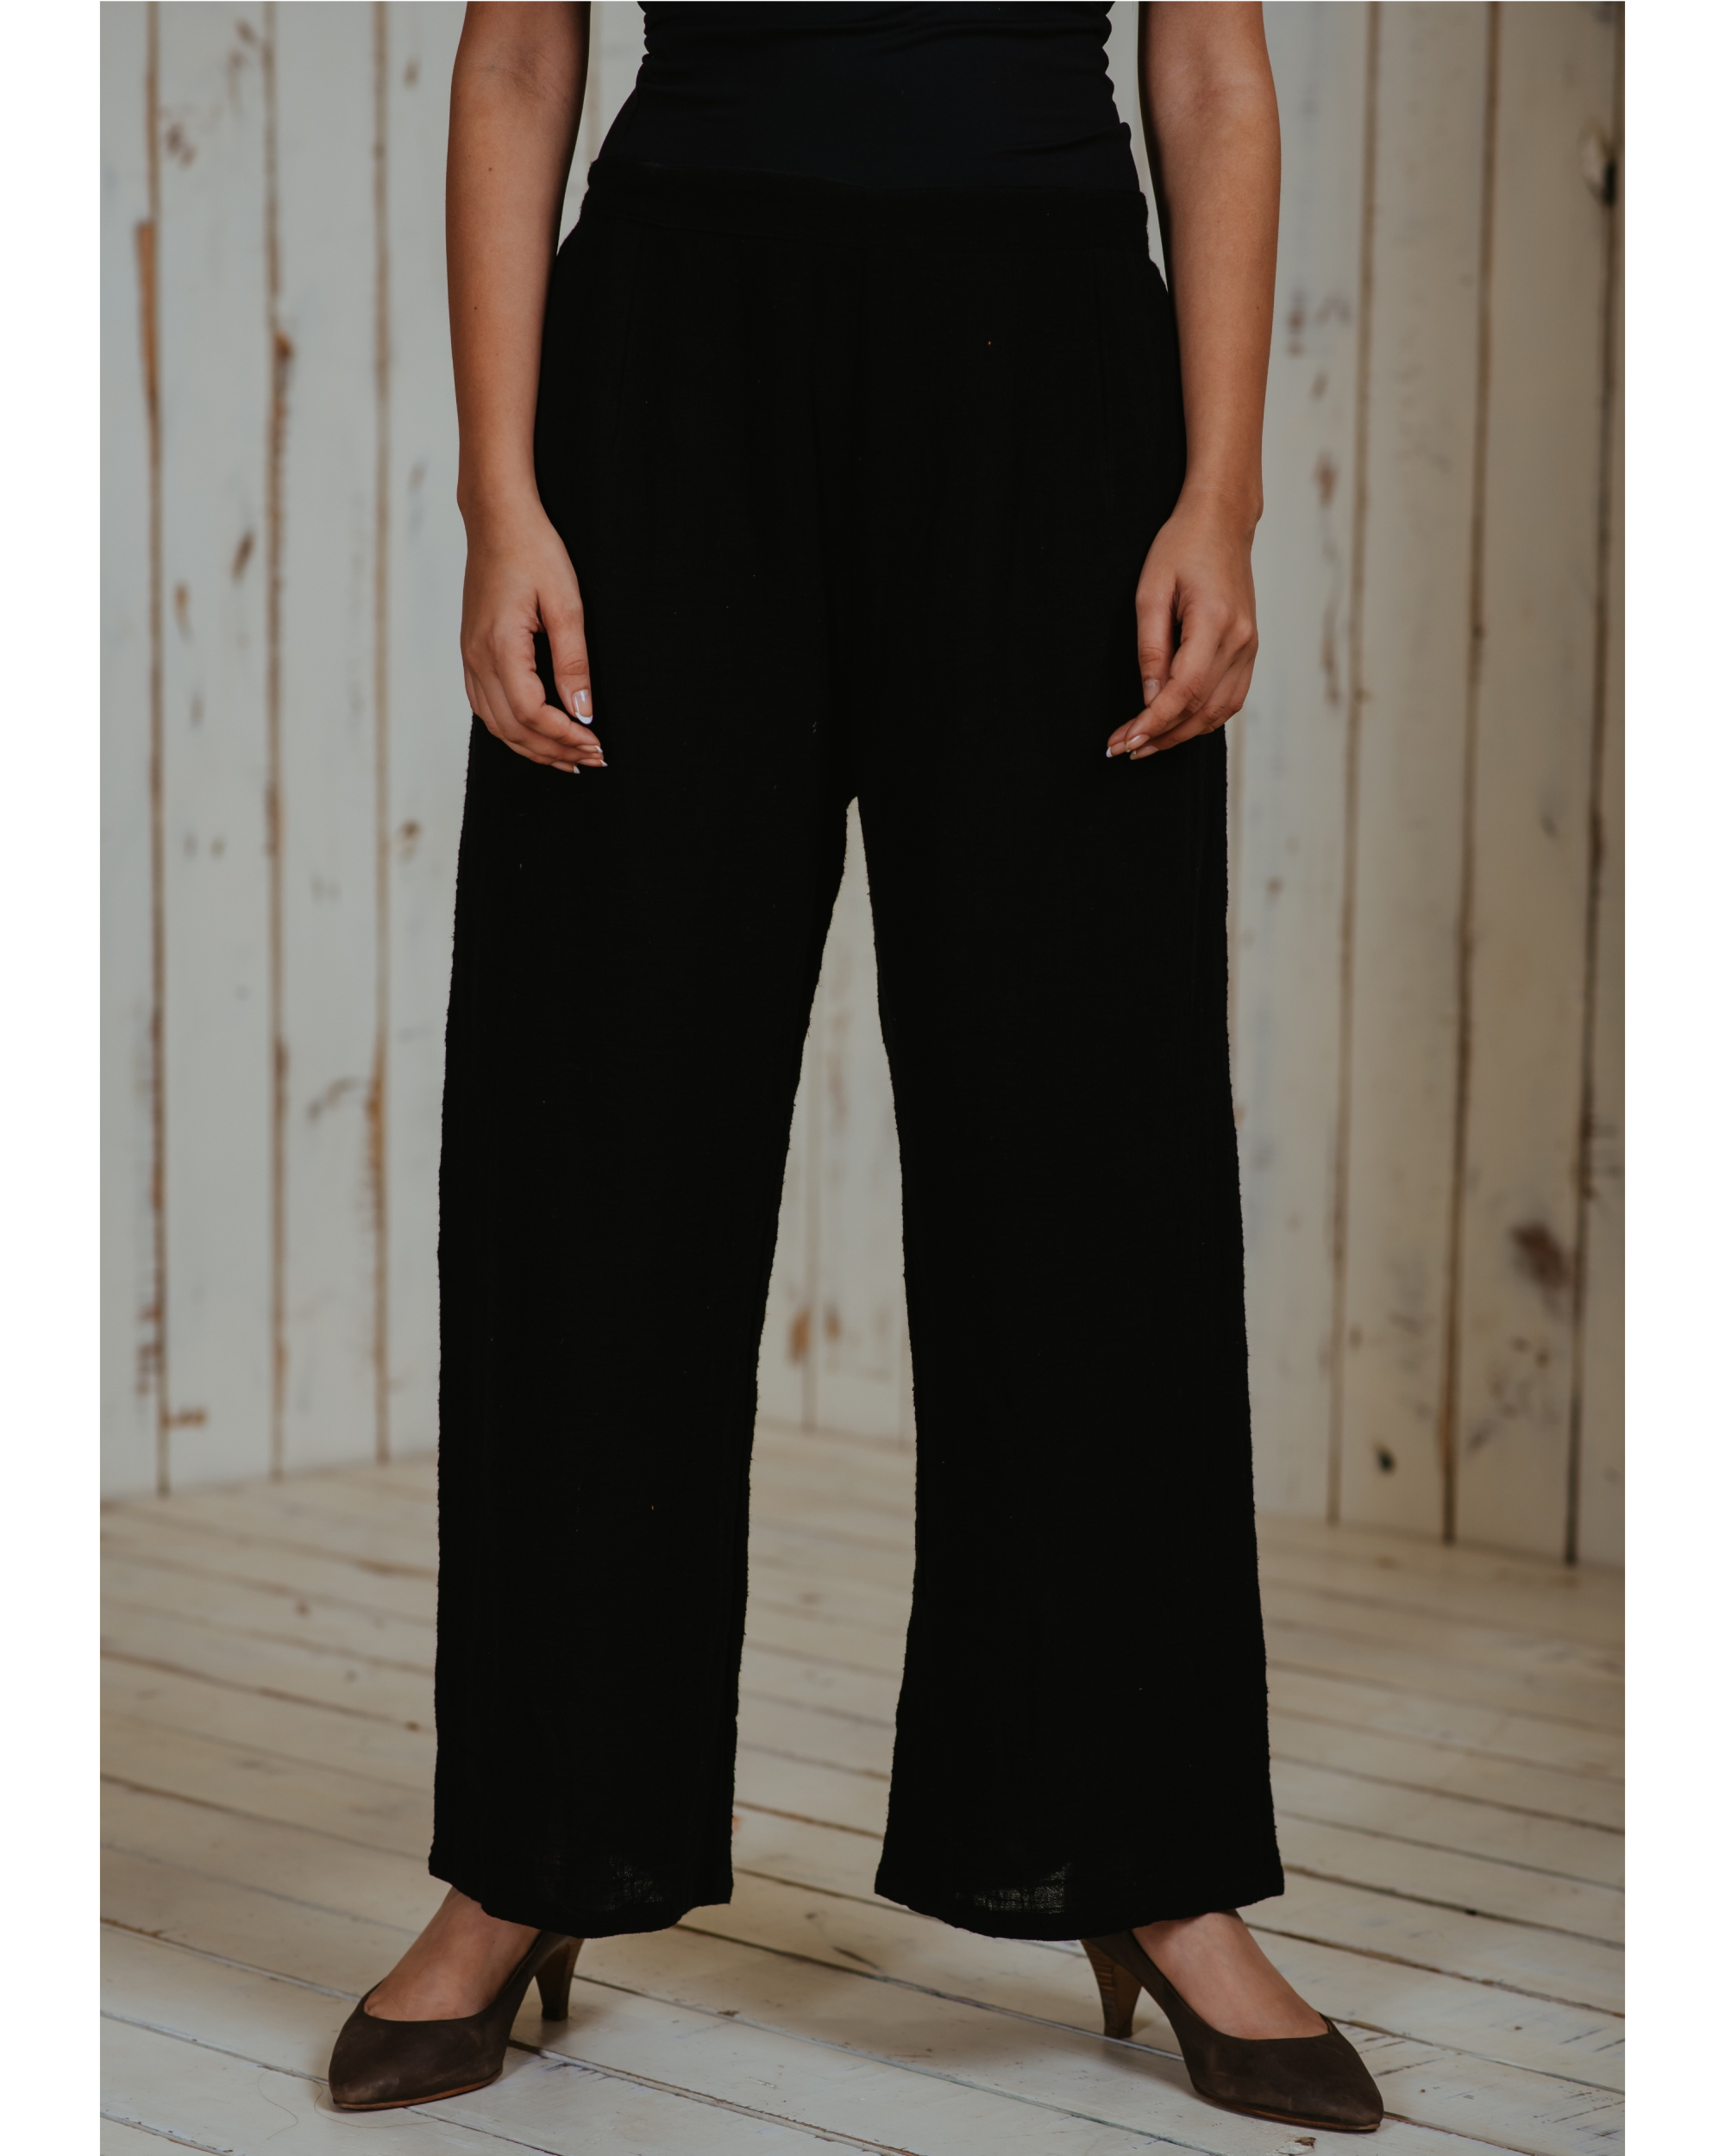 Black khadi pants